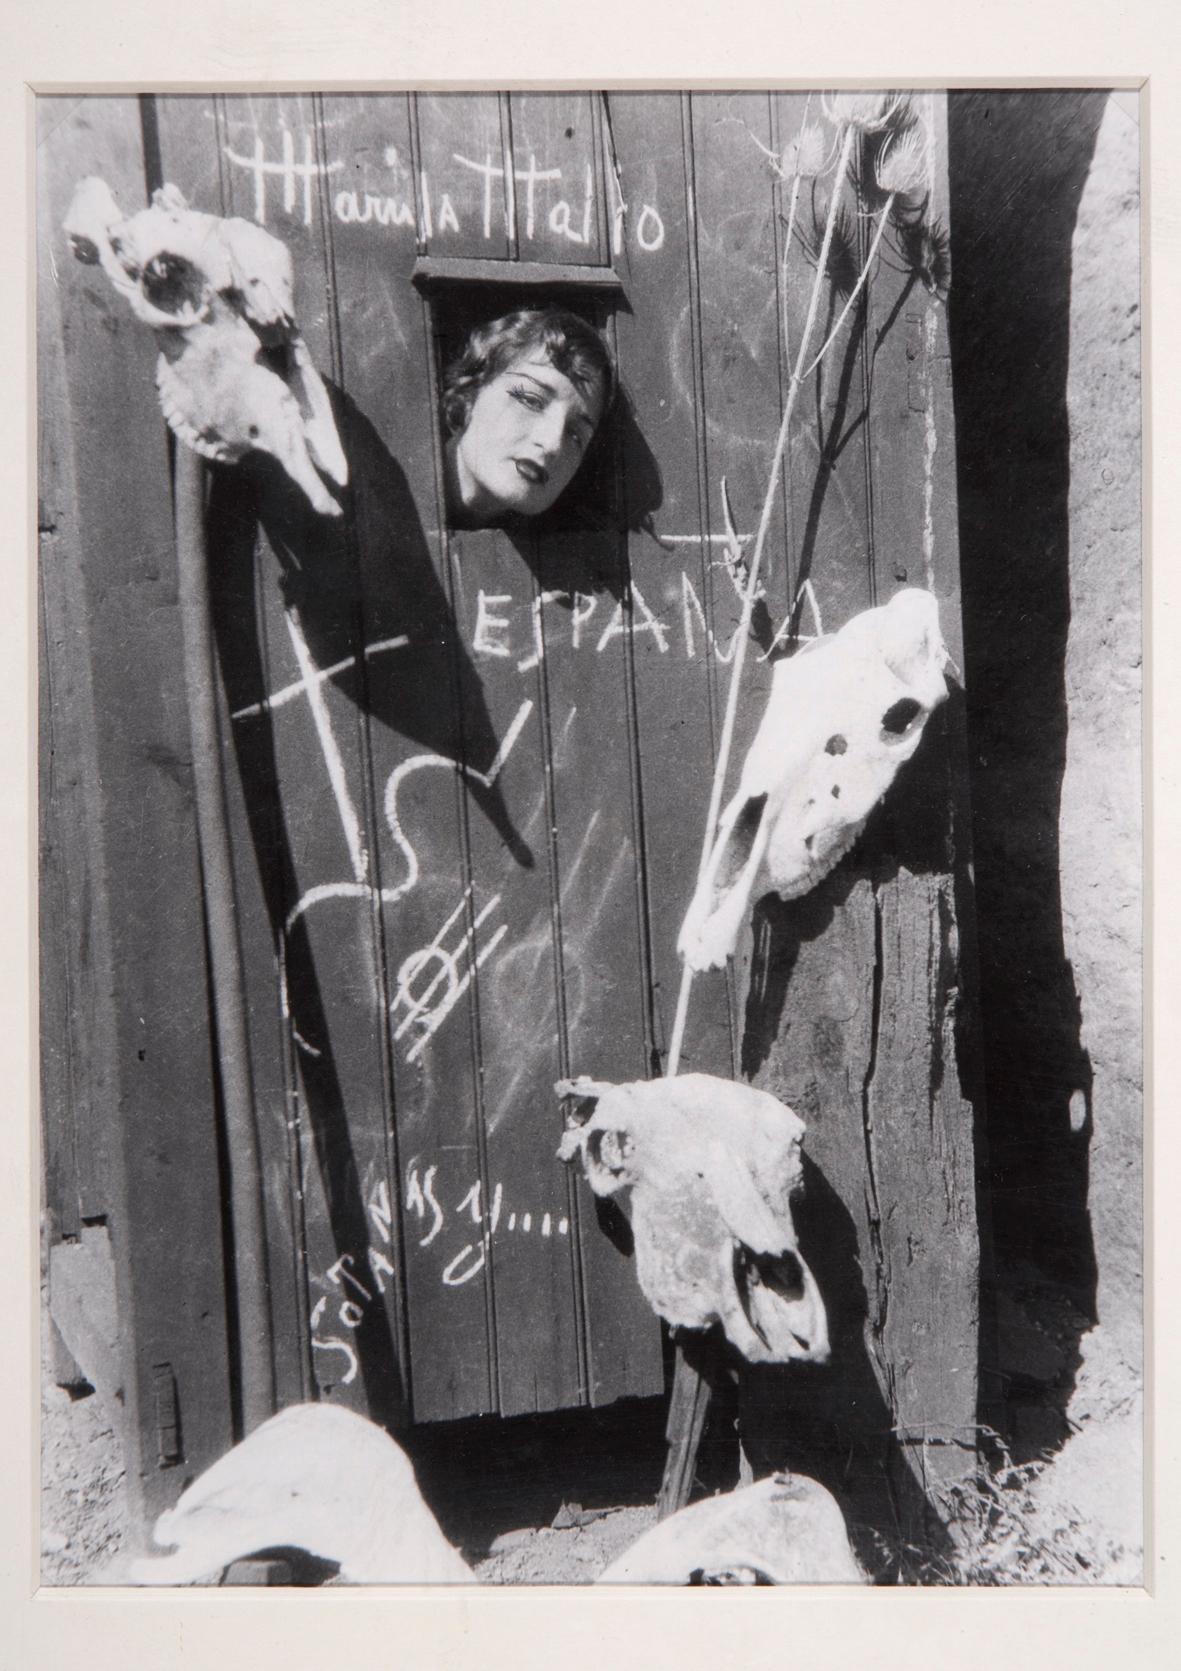 Pl�stica escenogr�fica, 1930